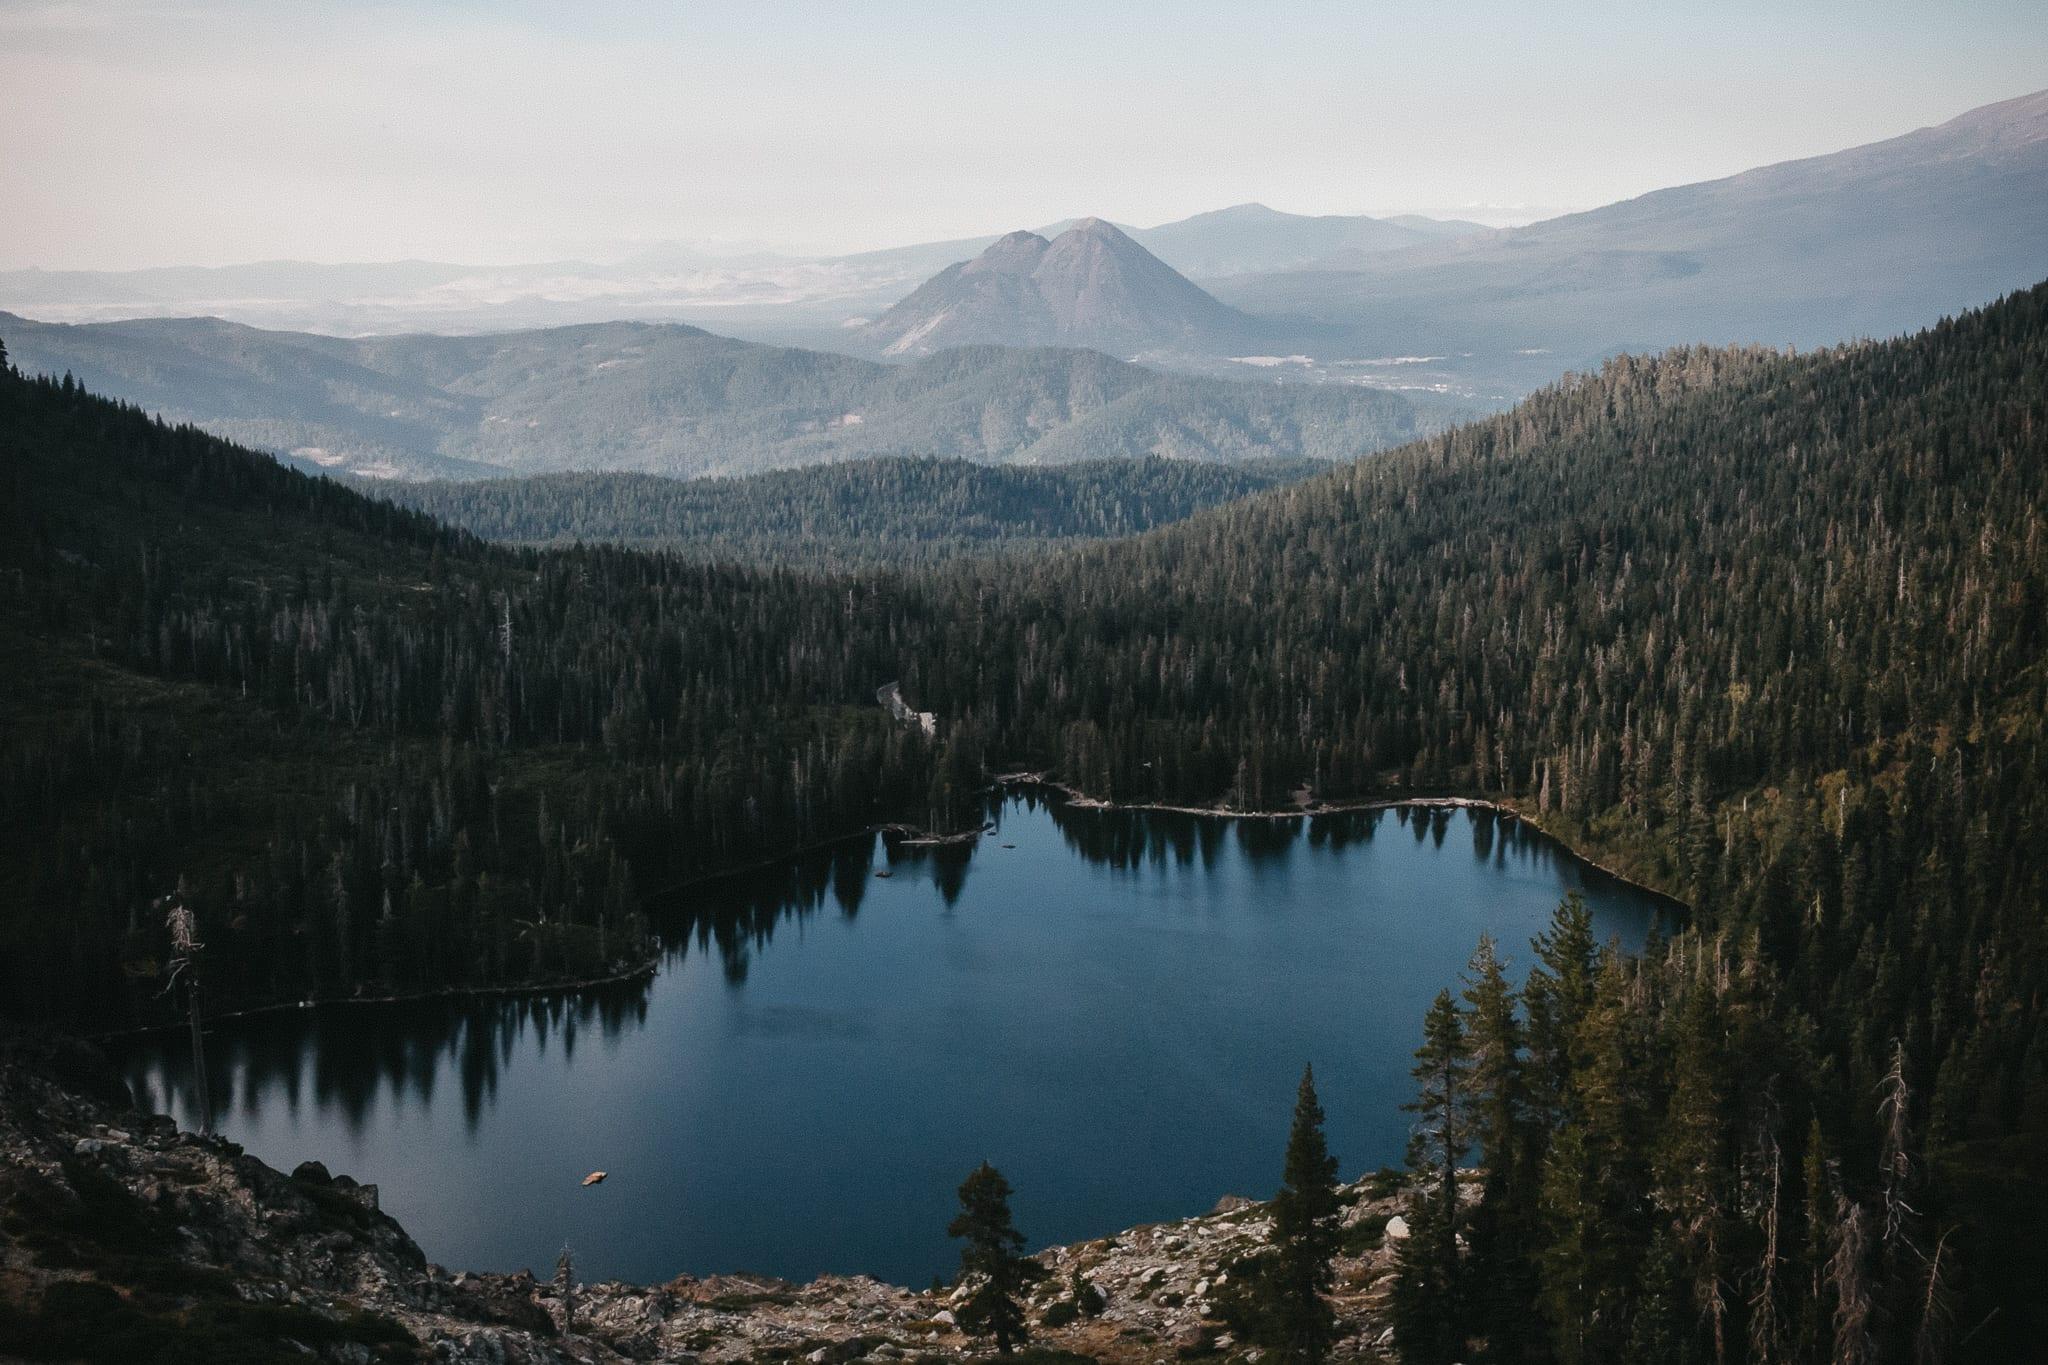 heart-lake-little-castle-lake-mt-shasta-7